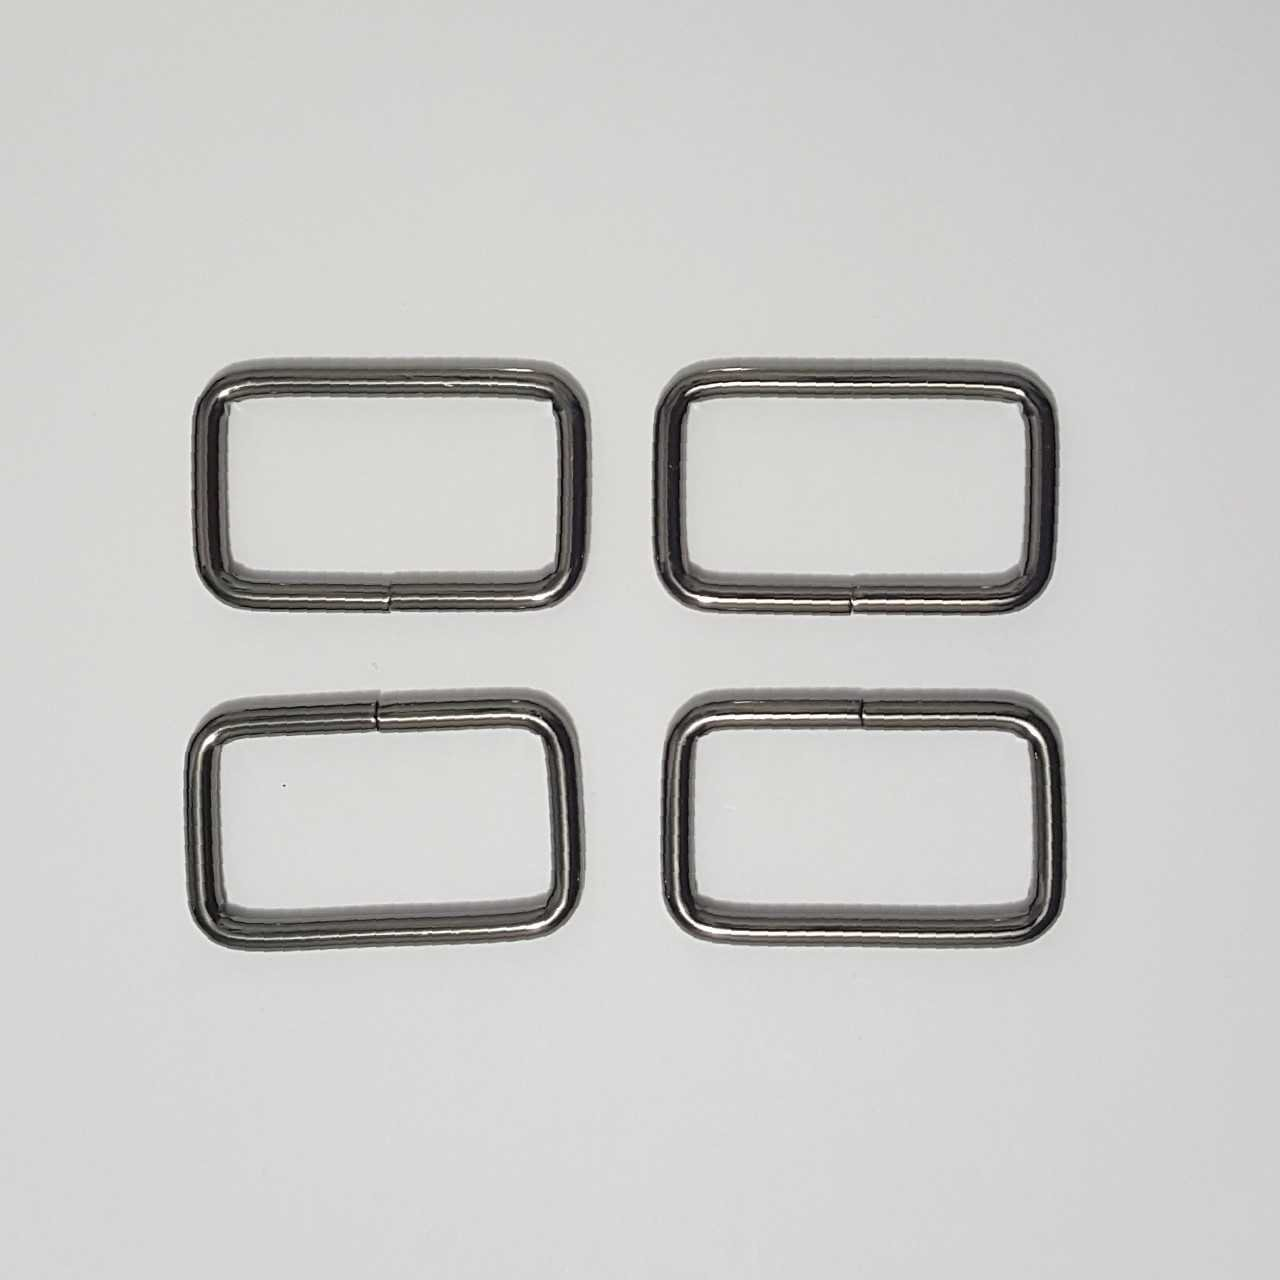 1.5- 4 Rectangle Rings - Gunmetal